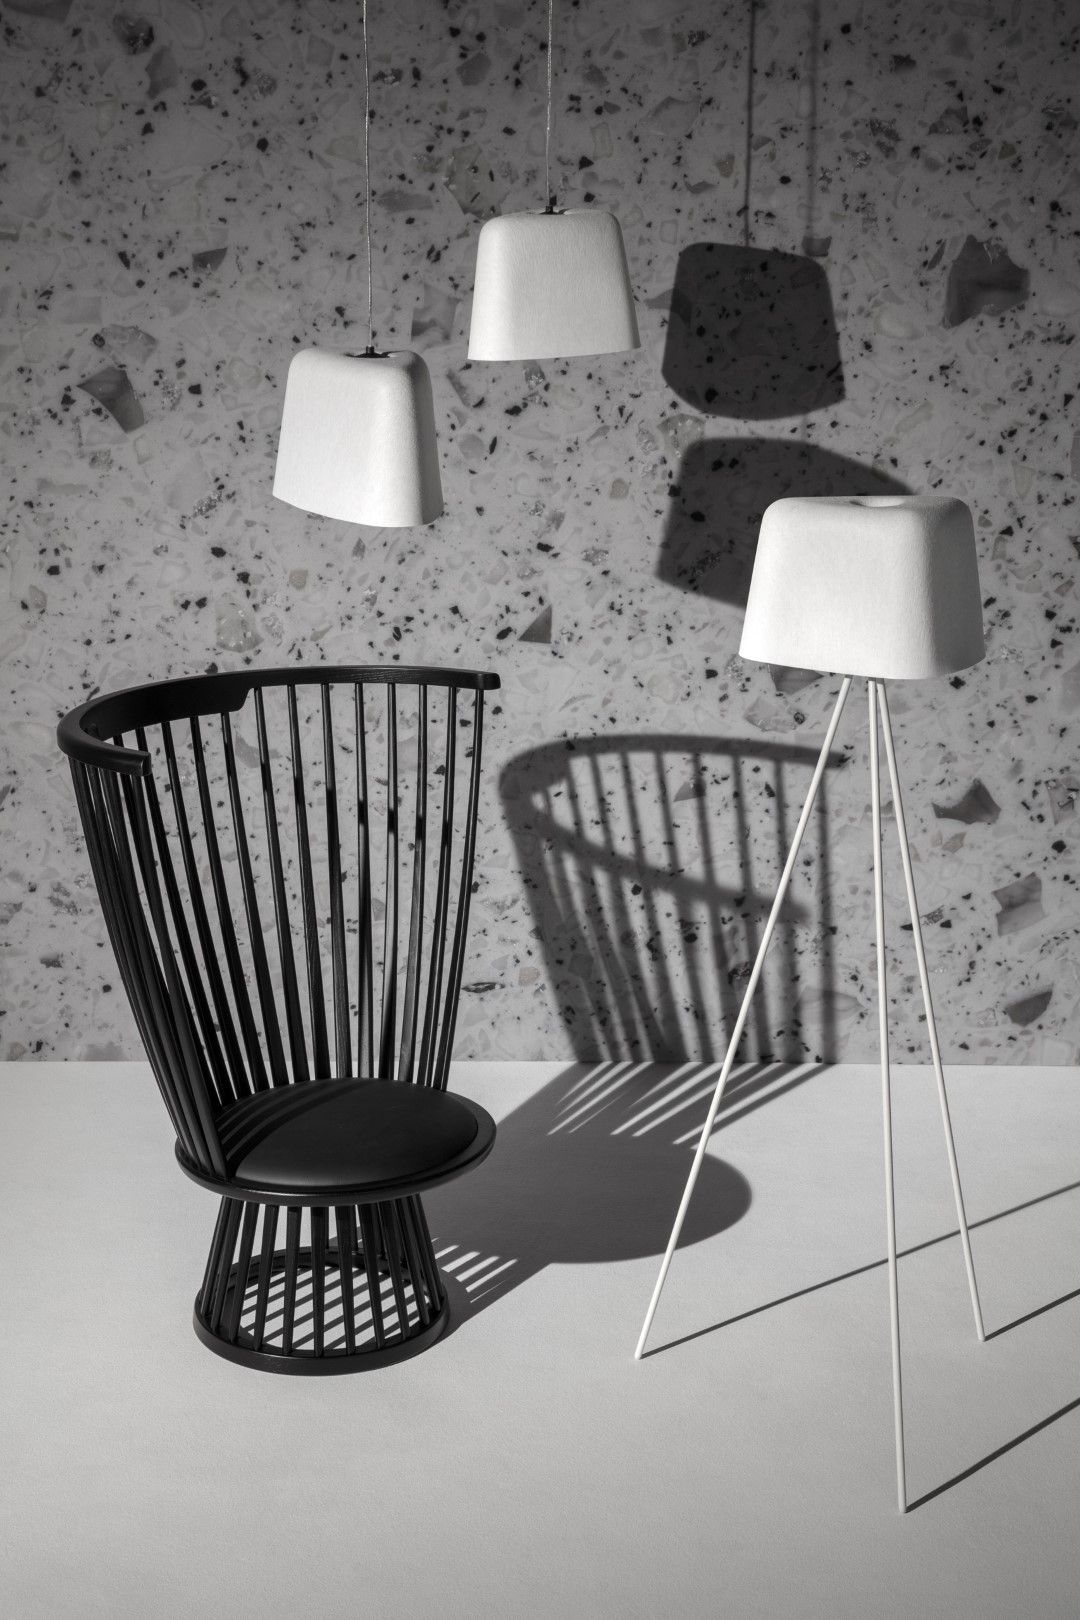 Buy Tom Dixon Fan Chair Black Amara In 2020 Luxury Interior Floor Lights Furniture Inspiration